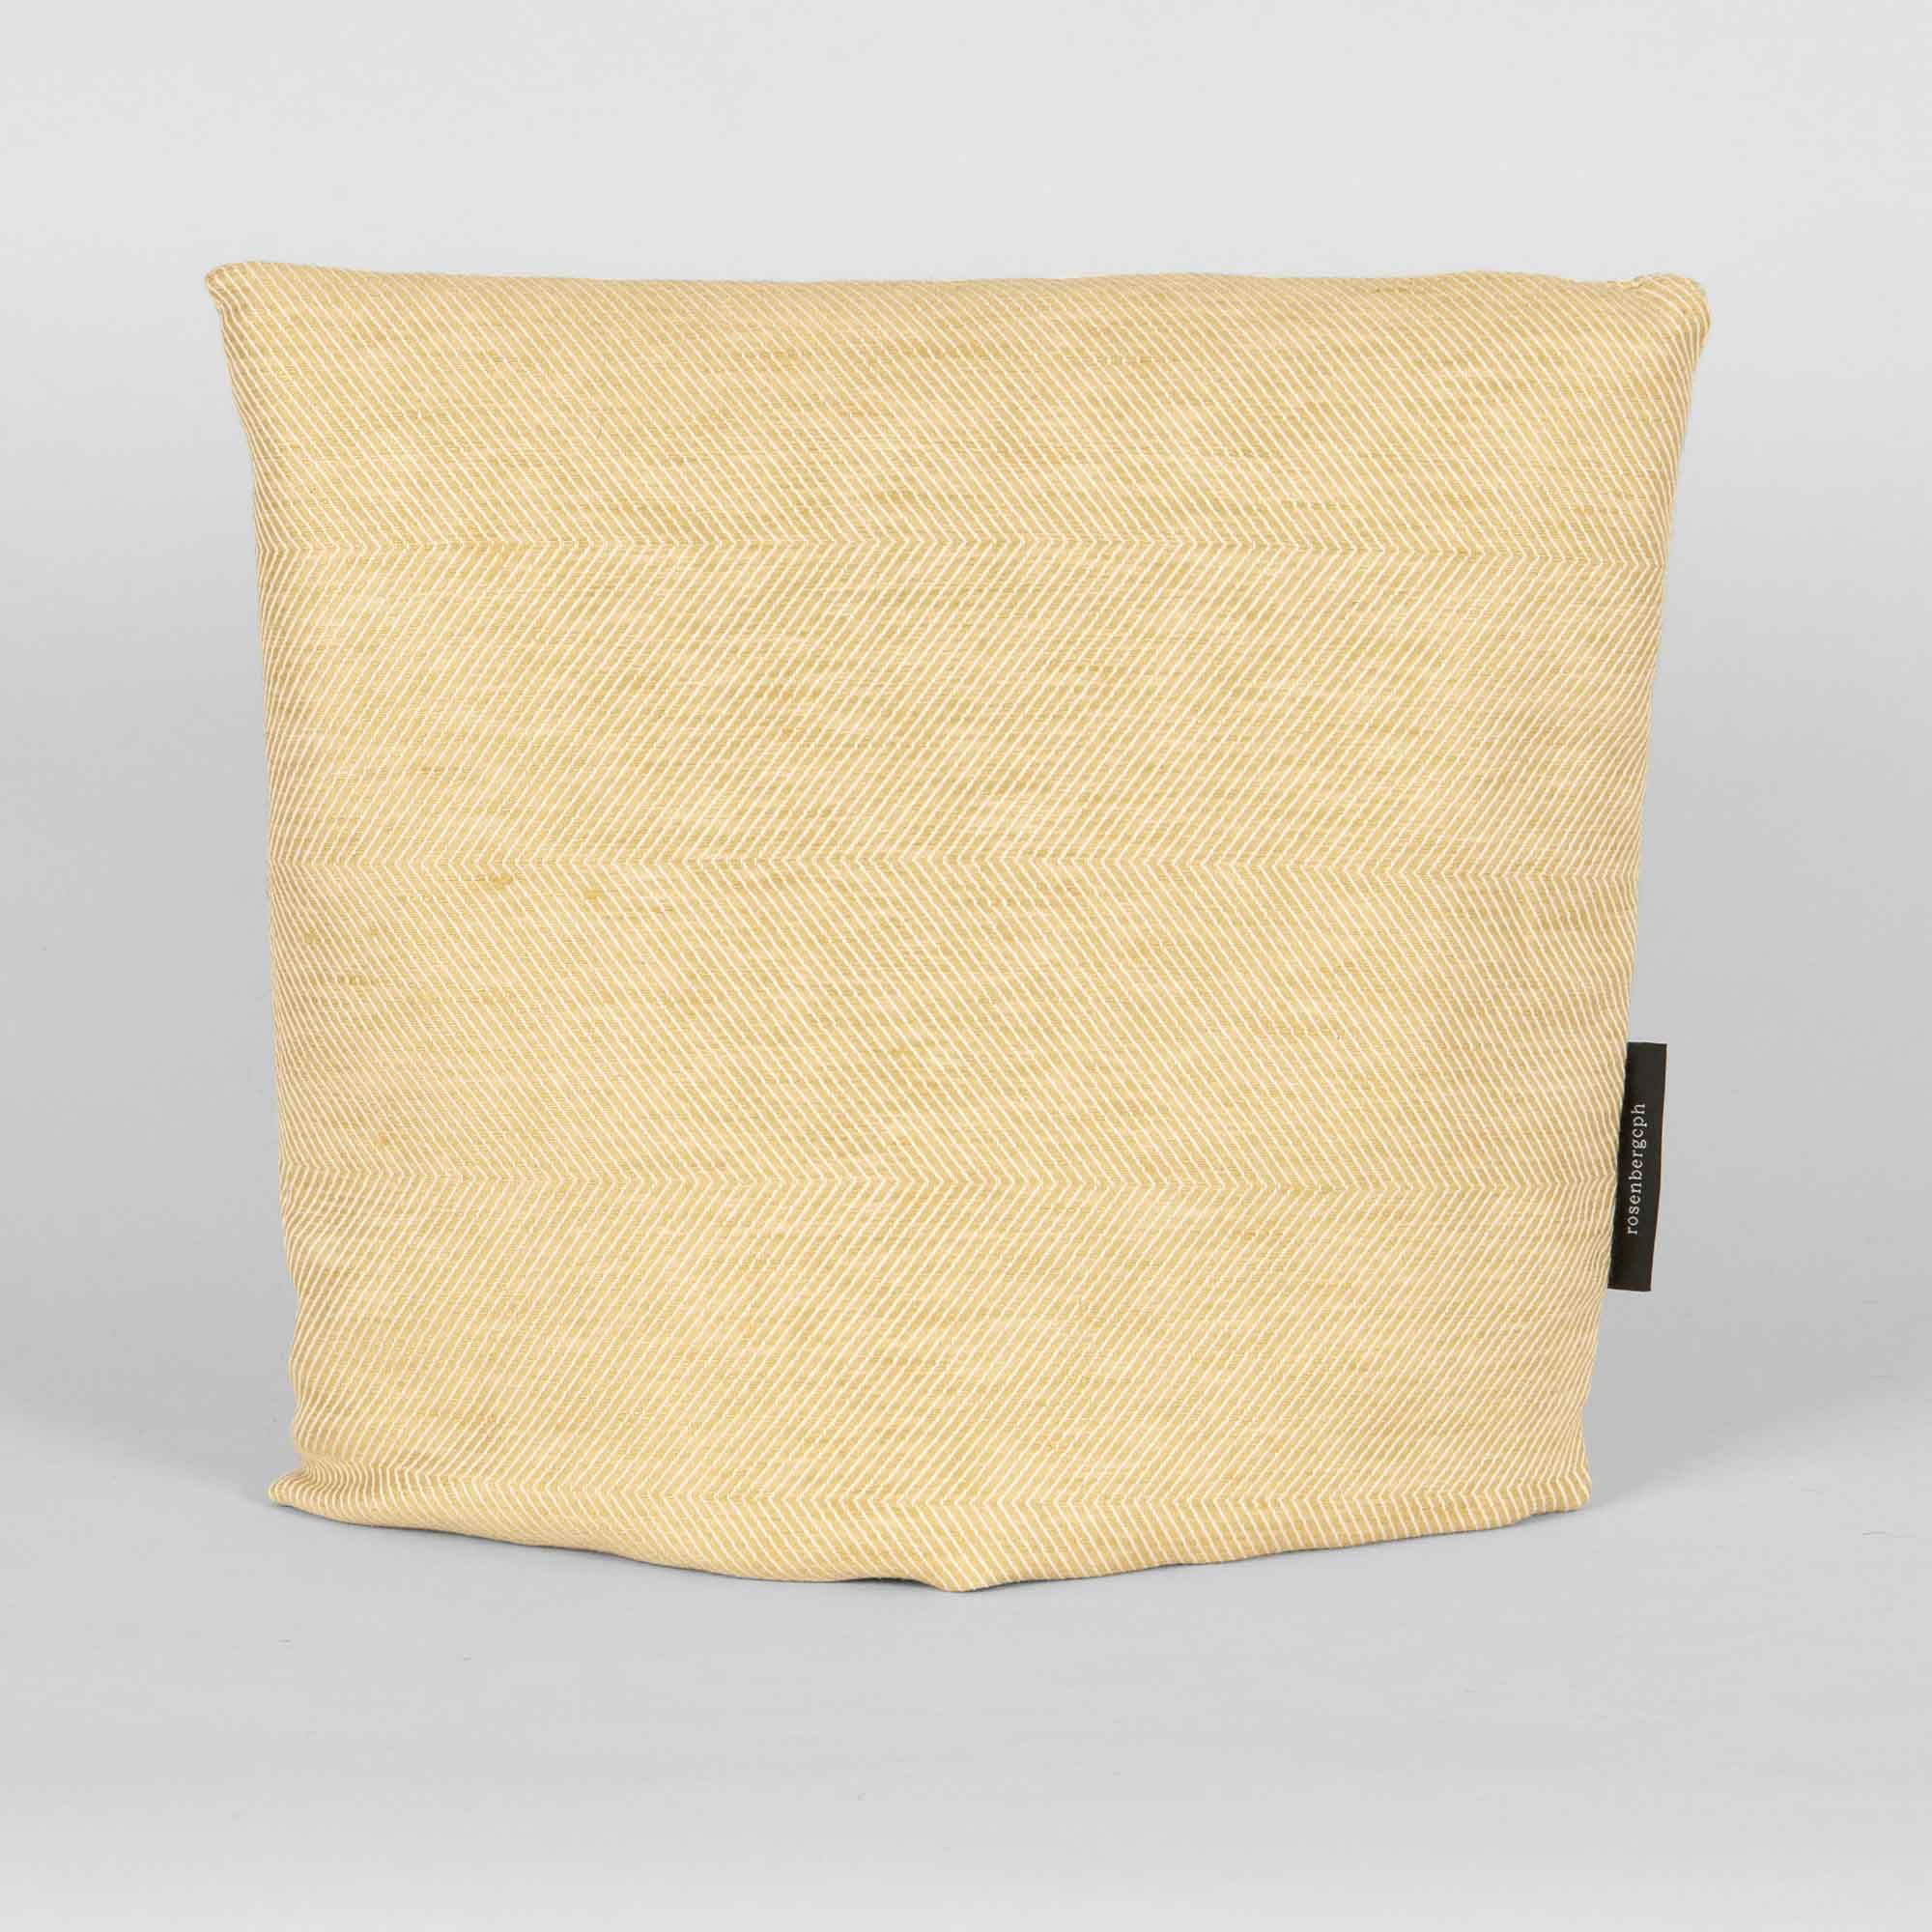 tea cosy, hay yellow, linen/cotton, design by Anne Rosenberg, RosenbergCph